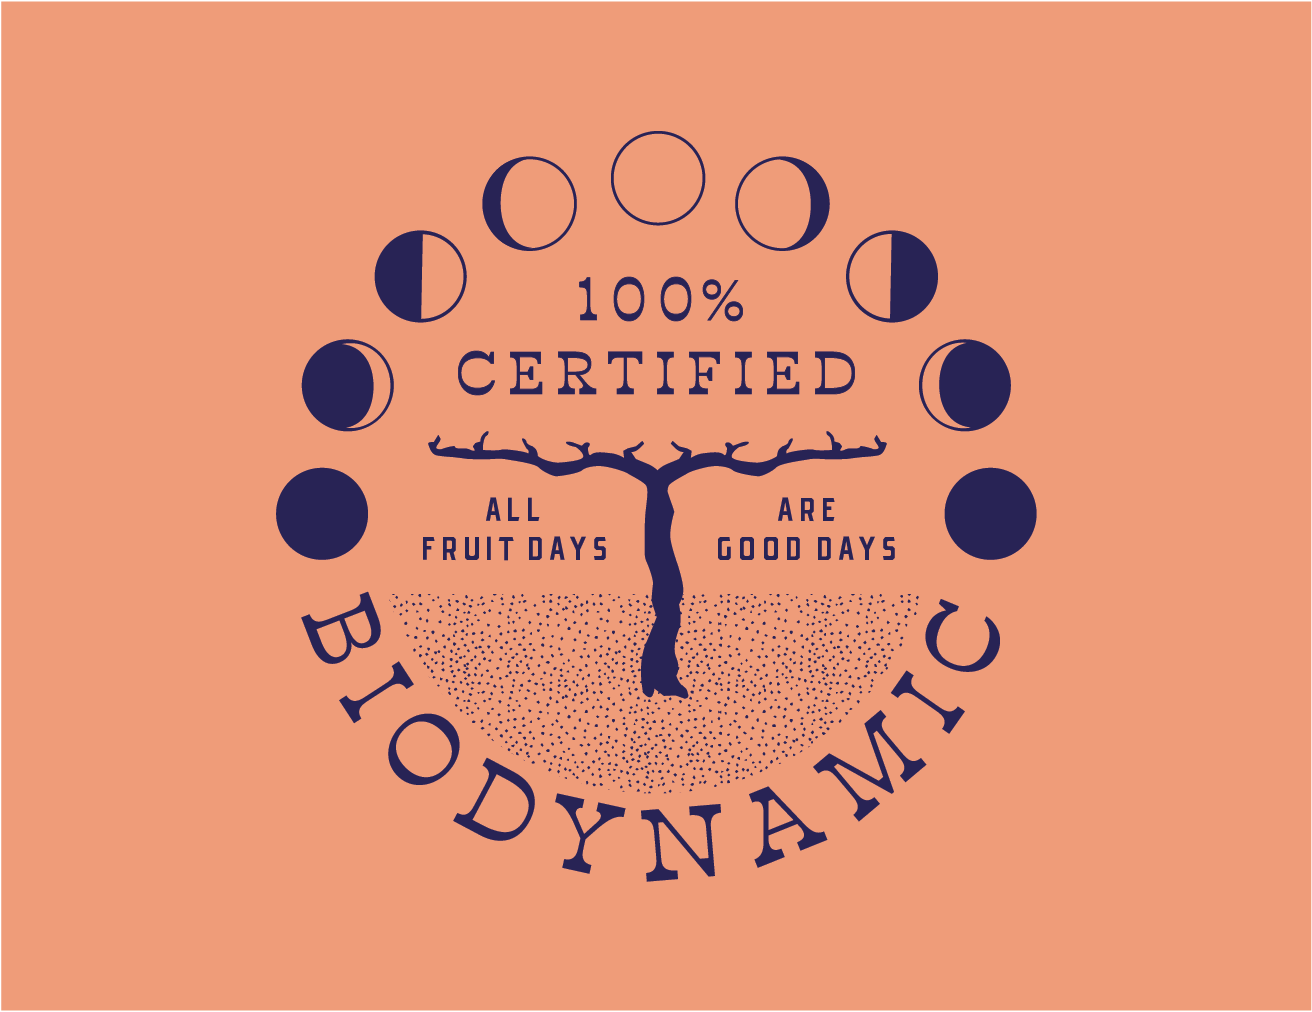 Lbiggar-Biodynamic-01.png